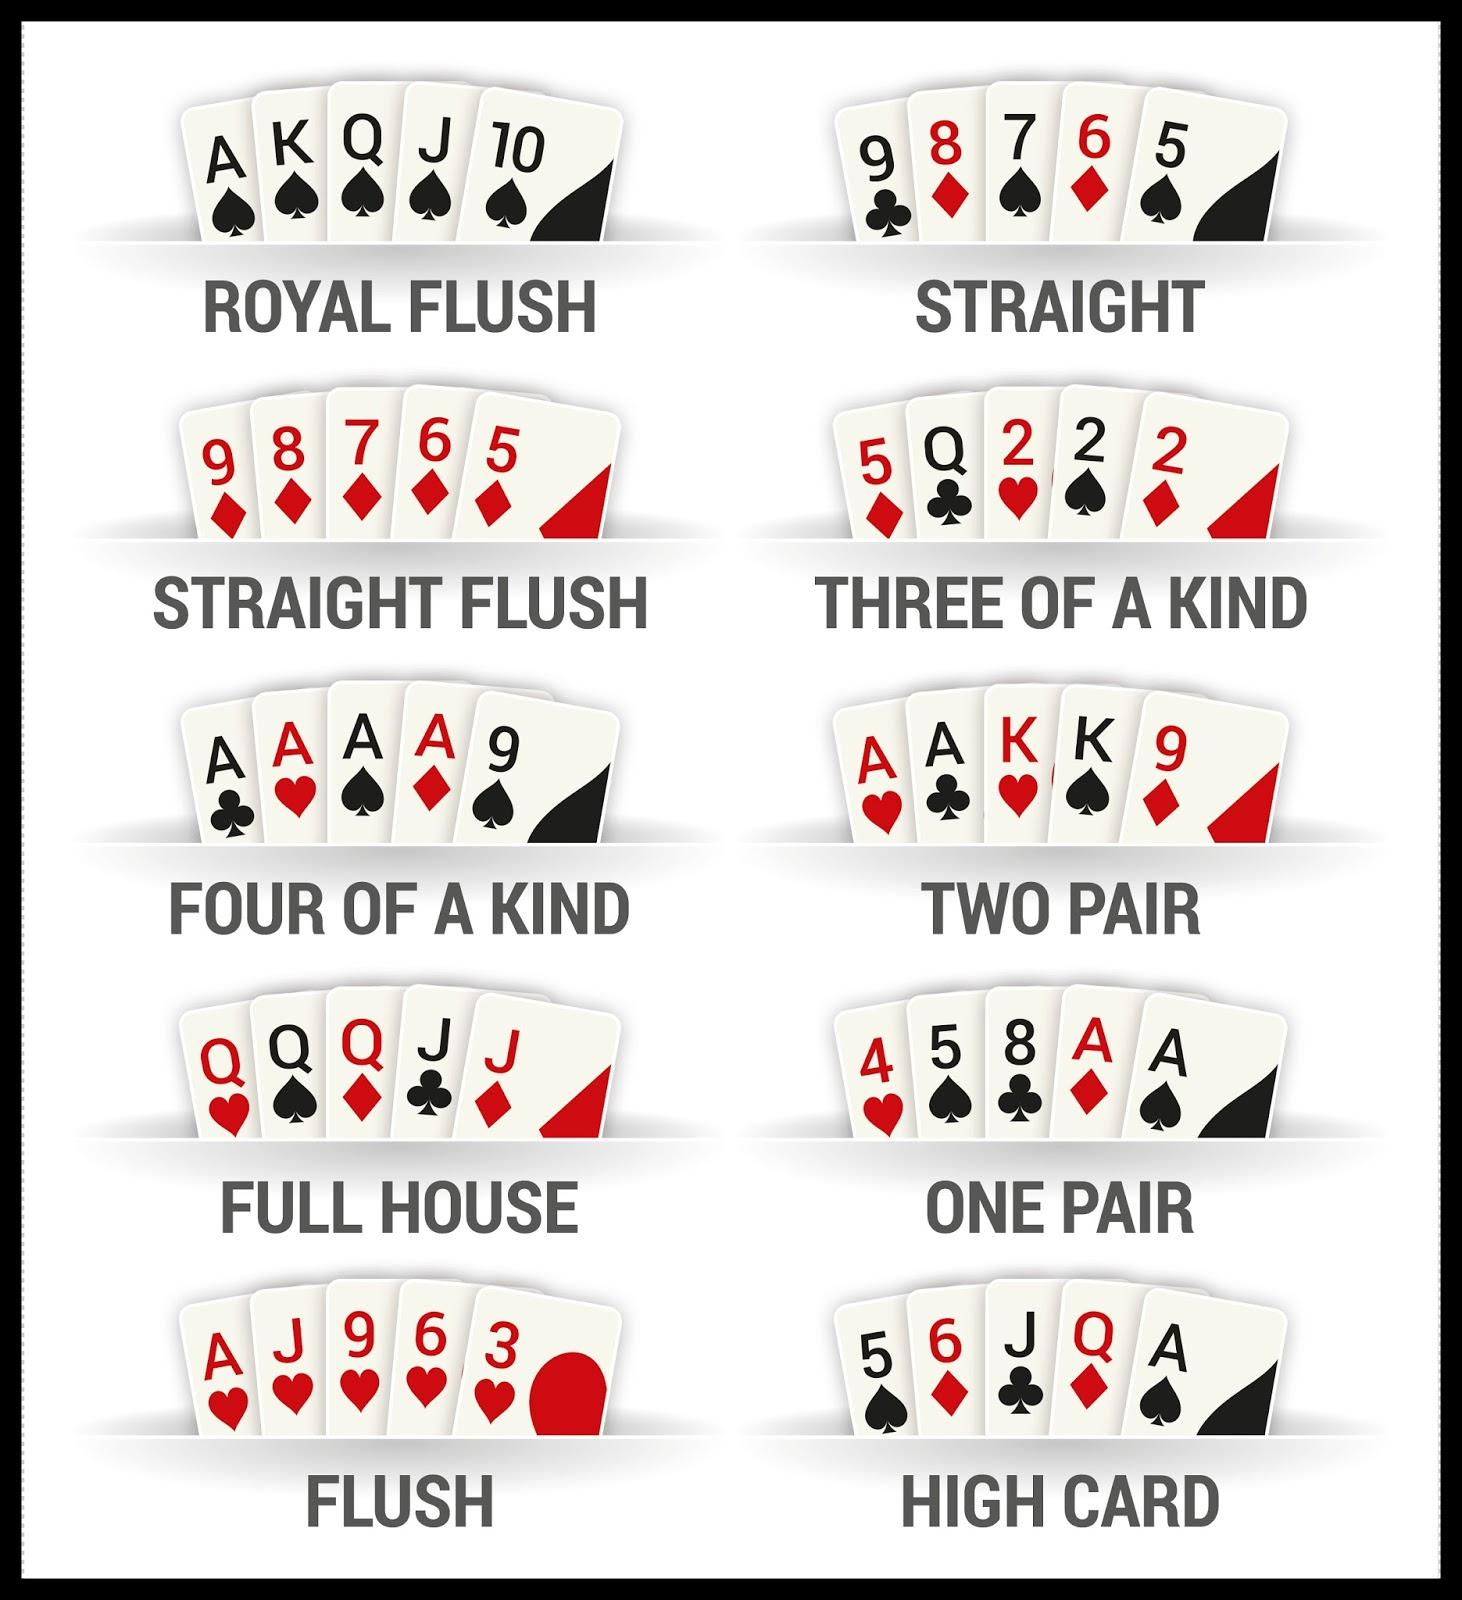 Cara Bermain Poker Di Asliqq